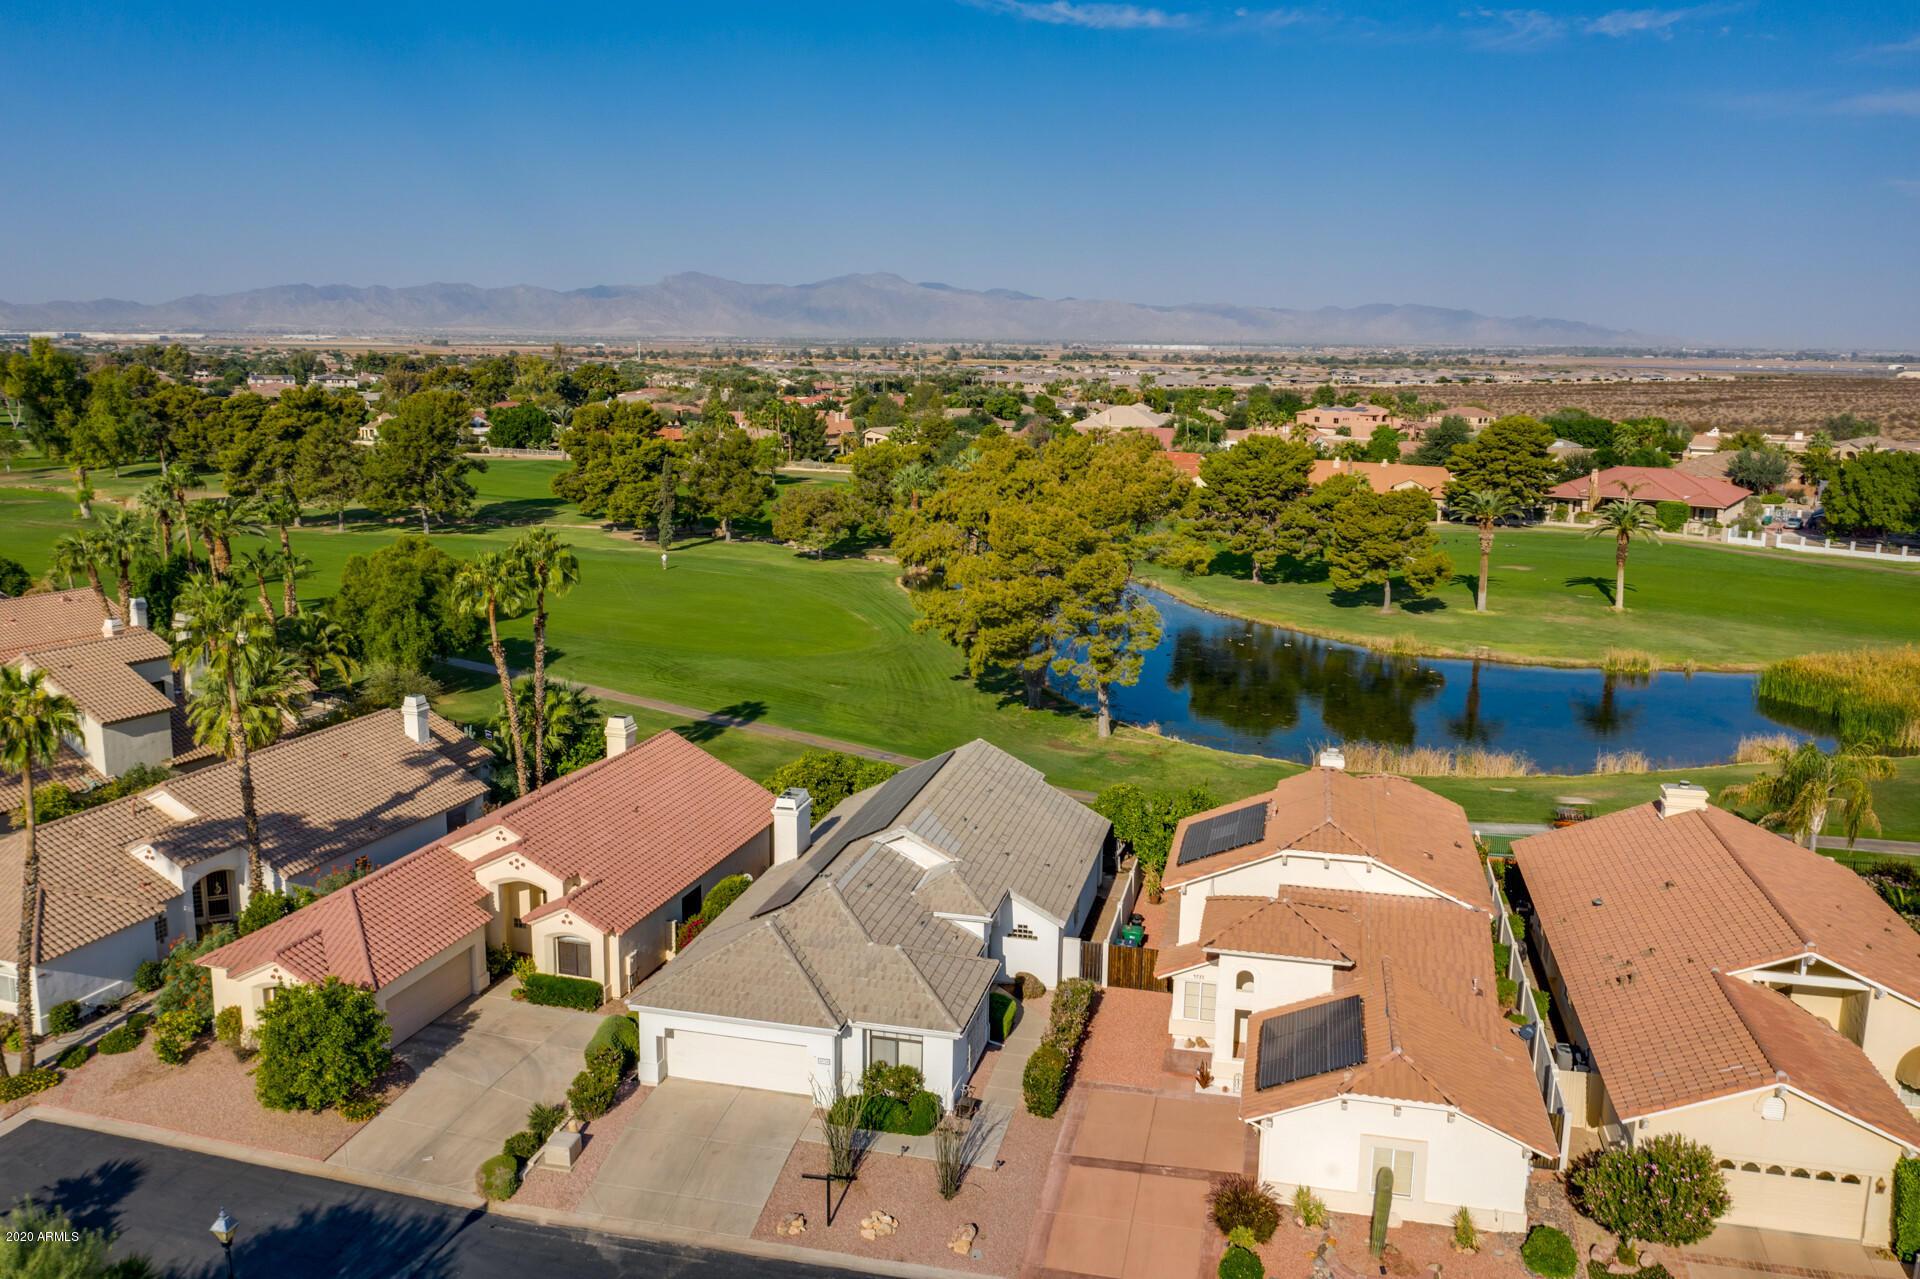 MLS 6141680 4734 N BROOKVIEW Terrace, Litchfield Park, AZ 85340 Litchfield Park AZ Gated